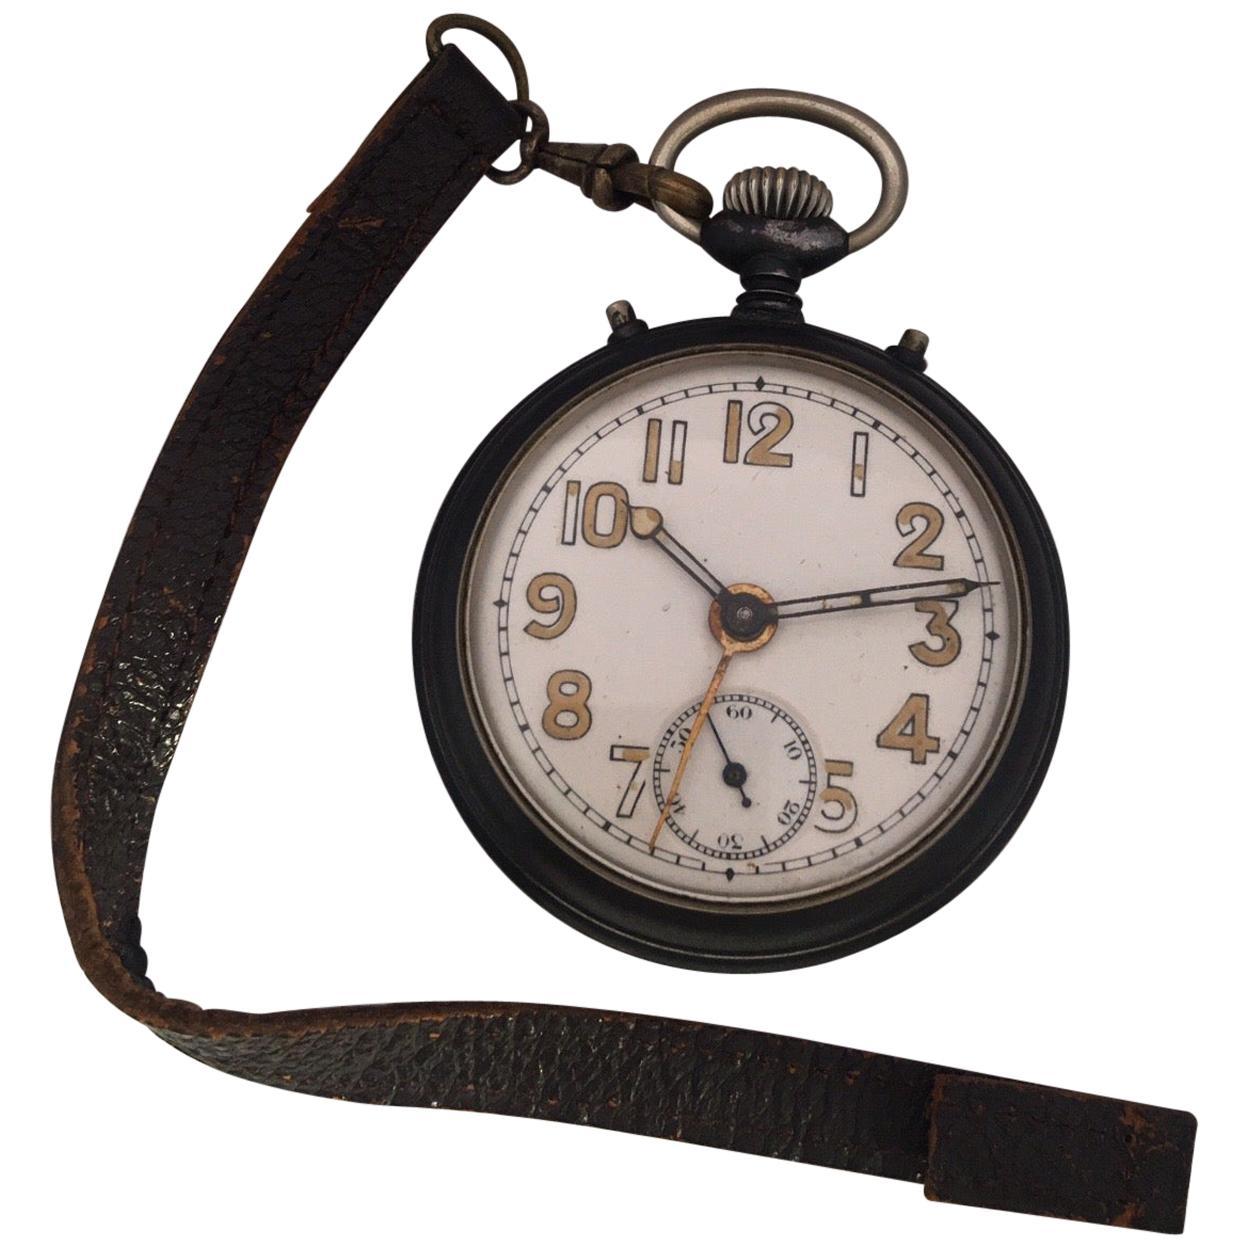 Antique Gunmetal Junghans Mechanical Travel Alarm Clock or Pocket Watch